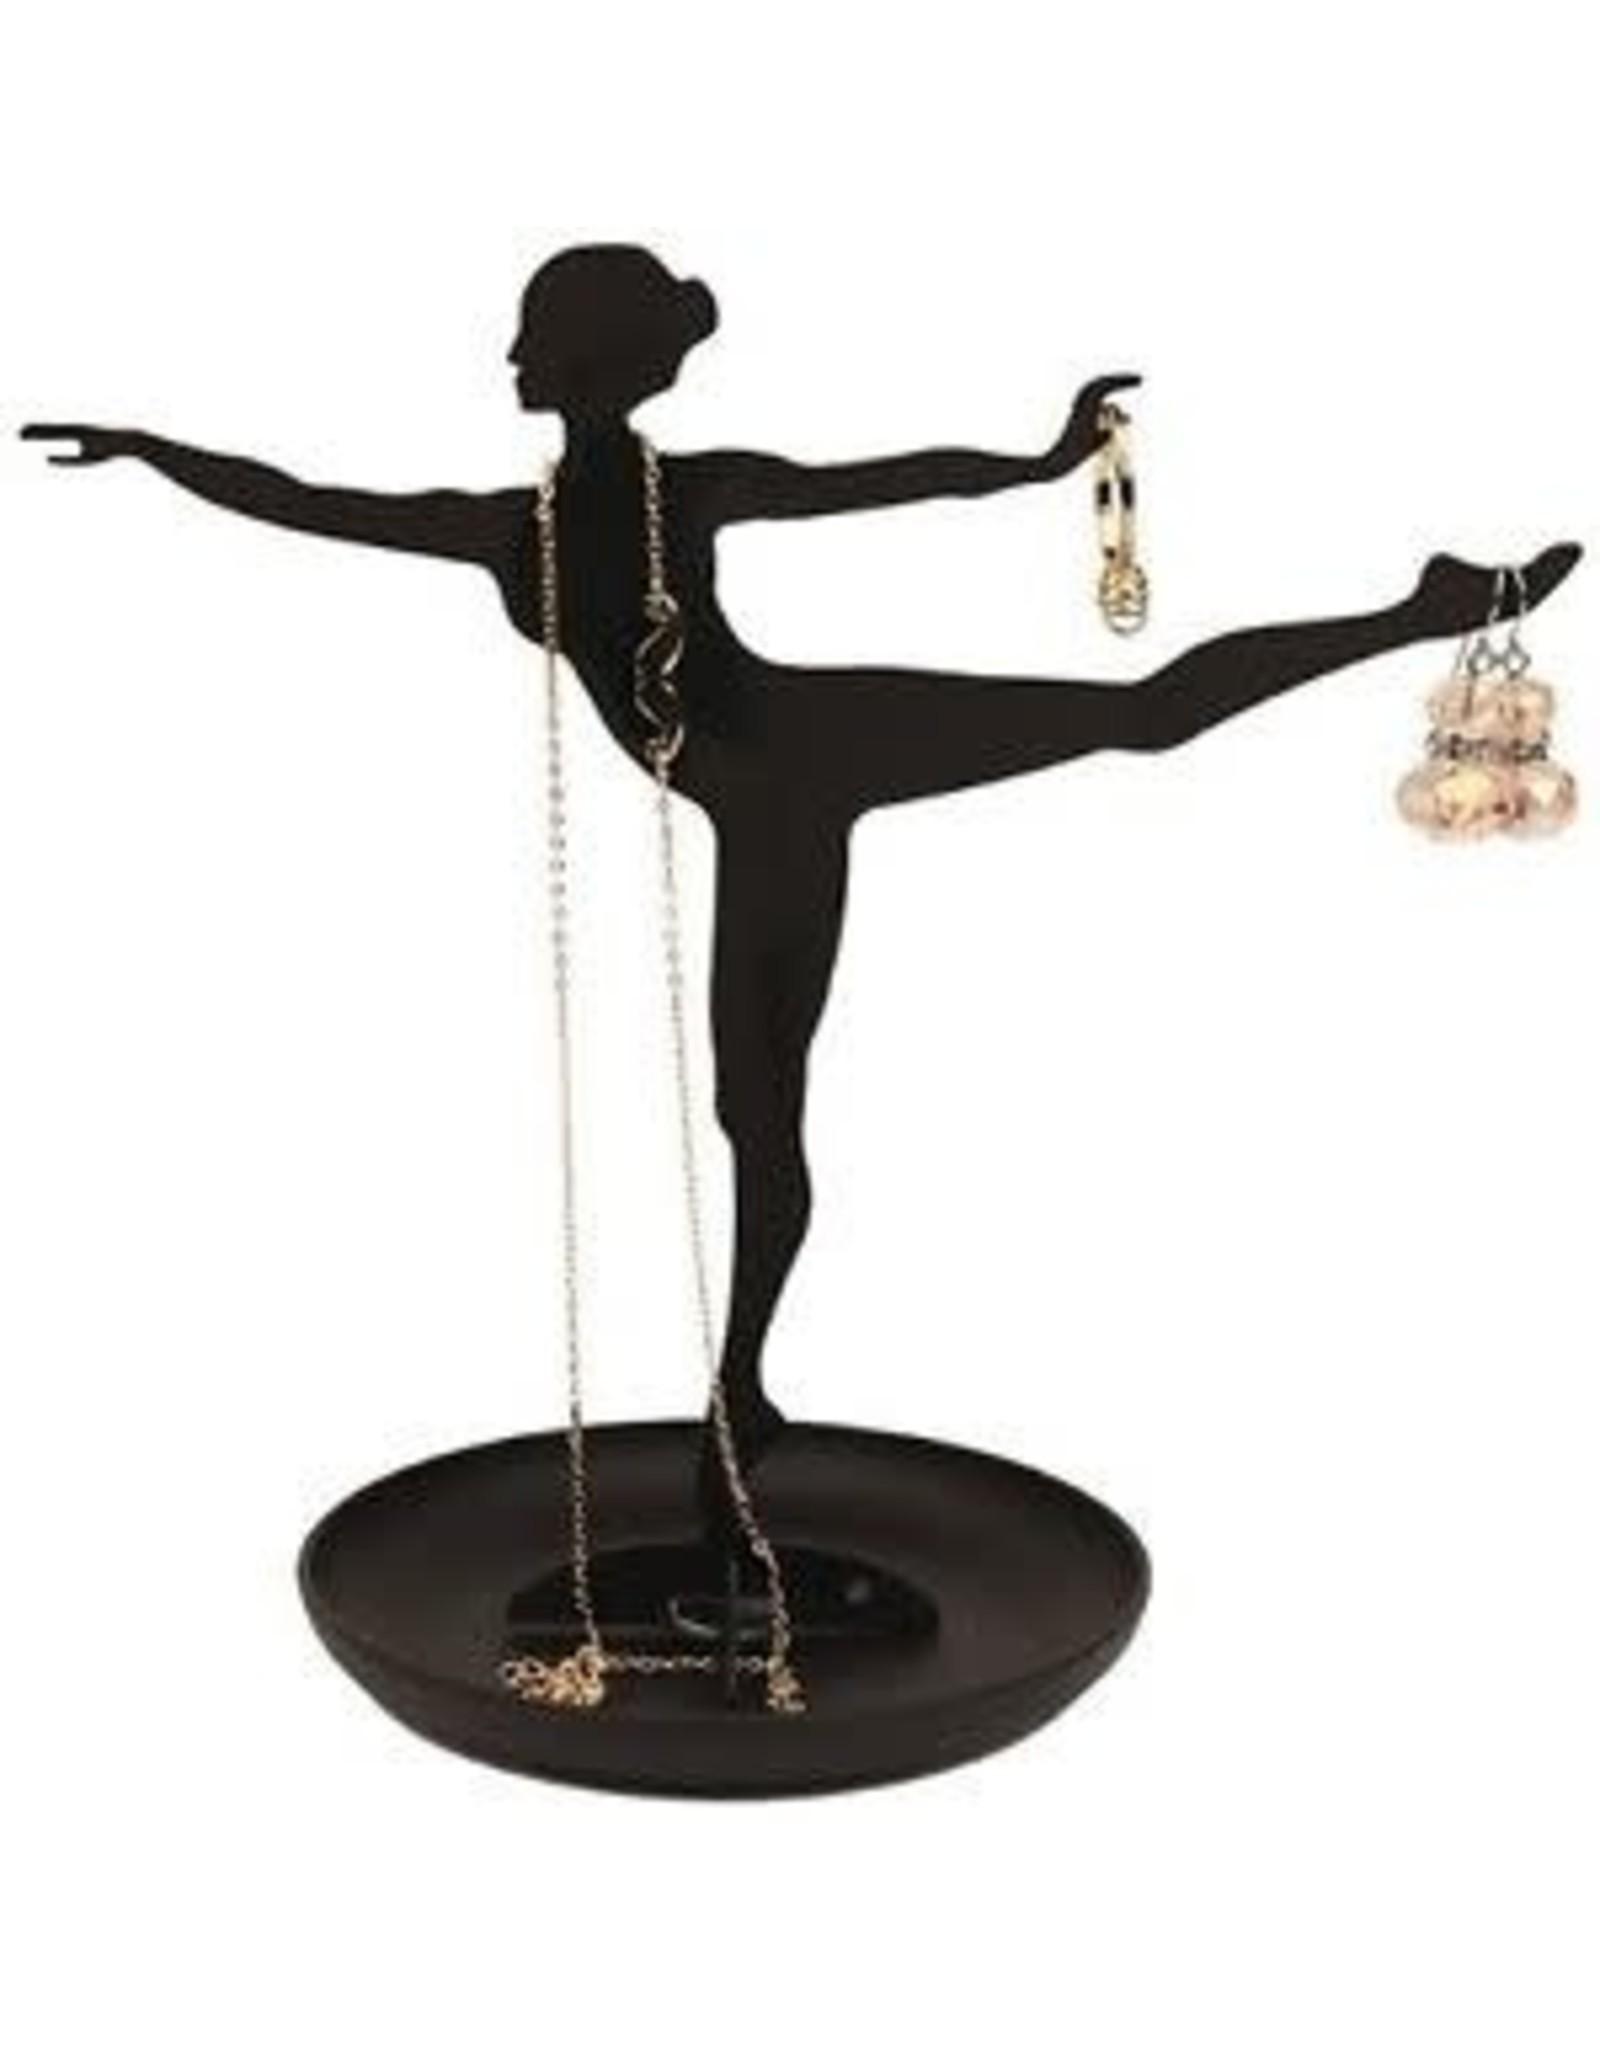 jewelry stand - ballerina